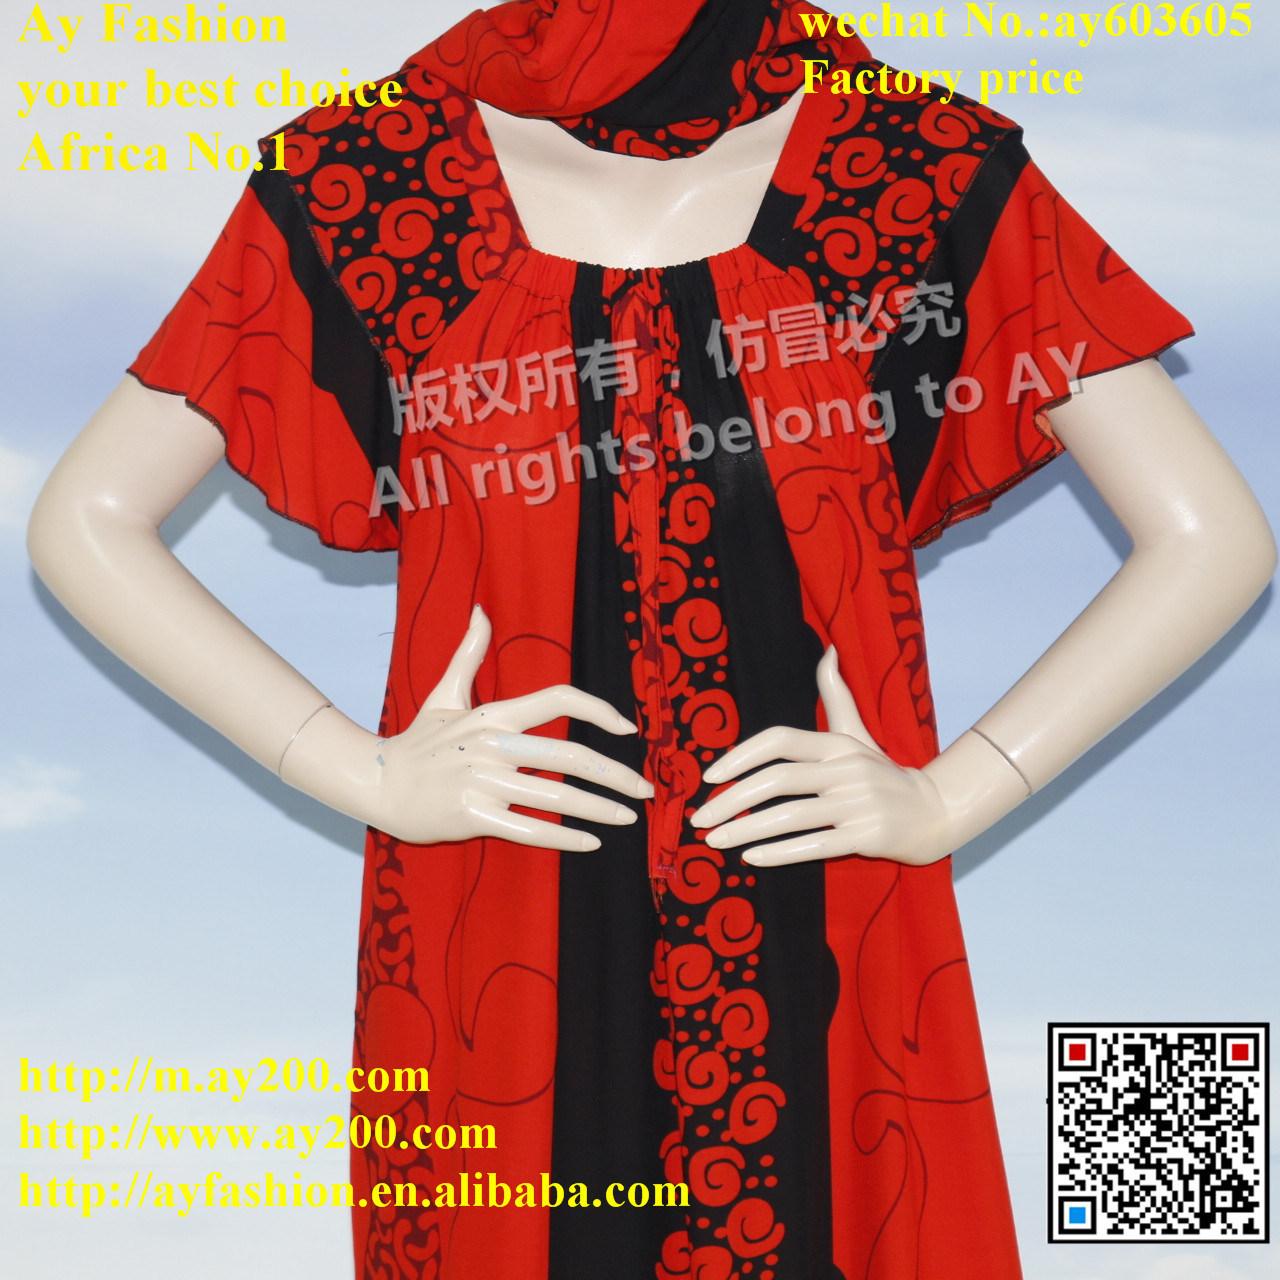 China Wholesale African Gowns Ladies Evening Kitenge Designs Elegant Kaftan Dress China New Design Dress And Lady Dress Price